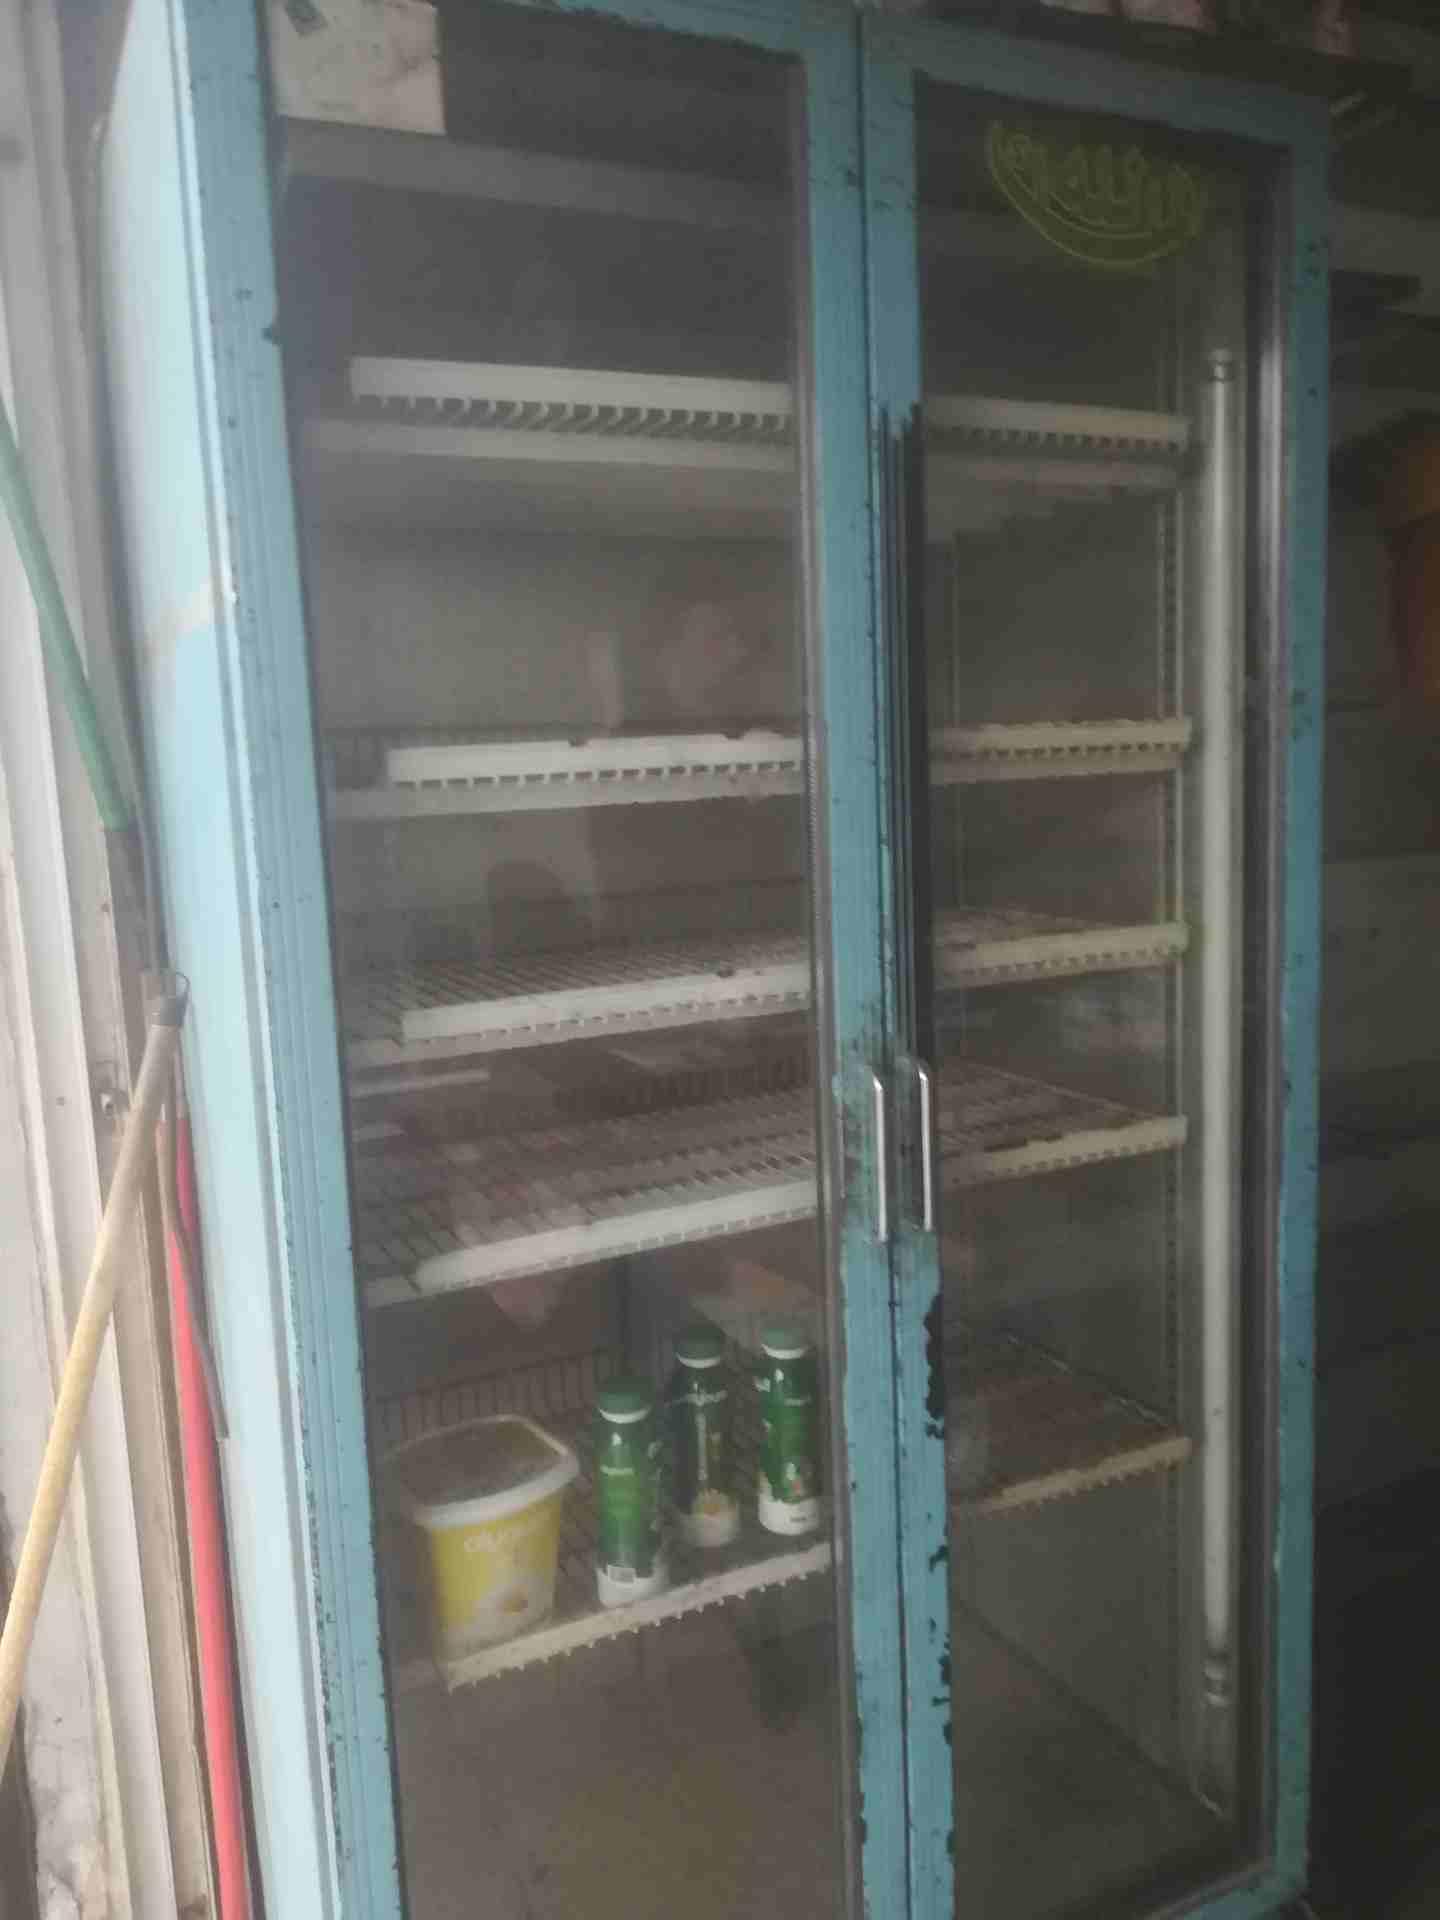 Hitachi latest model fridge with 2 doors up and down-  ثلاجه عرض بابين شغاله...